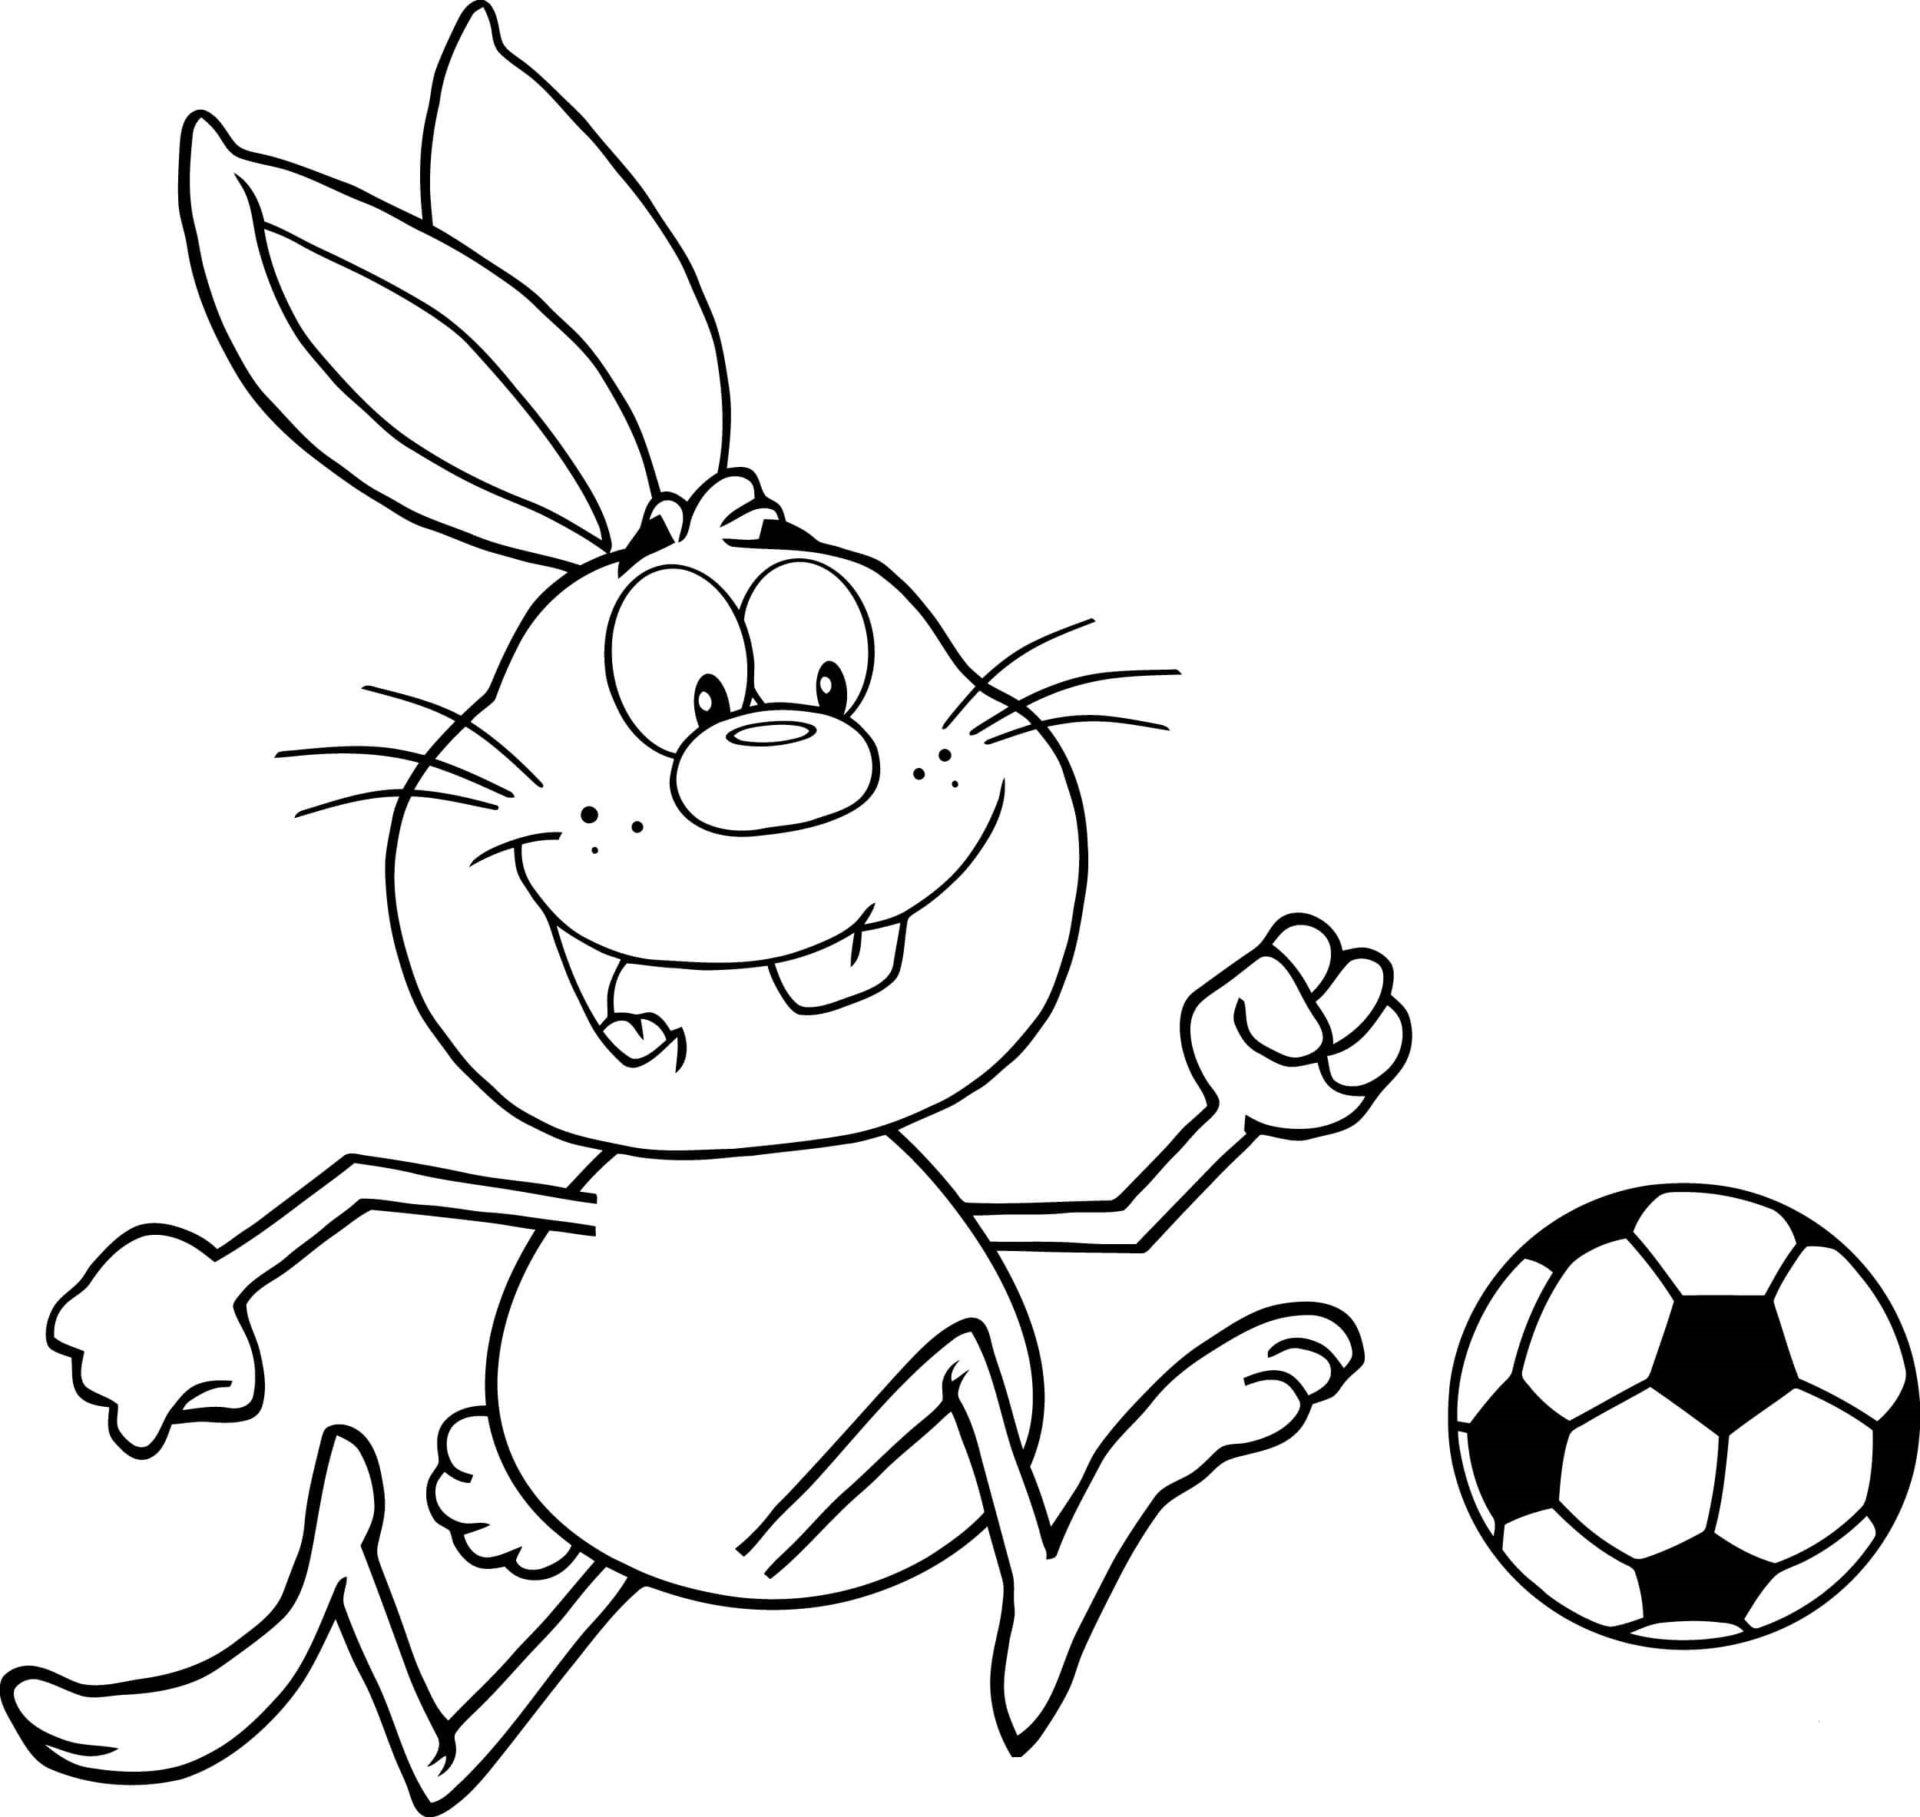 Rabbit Playing Soccer